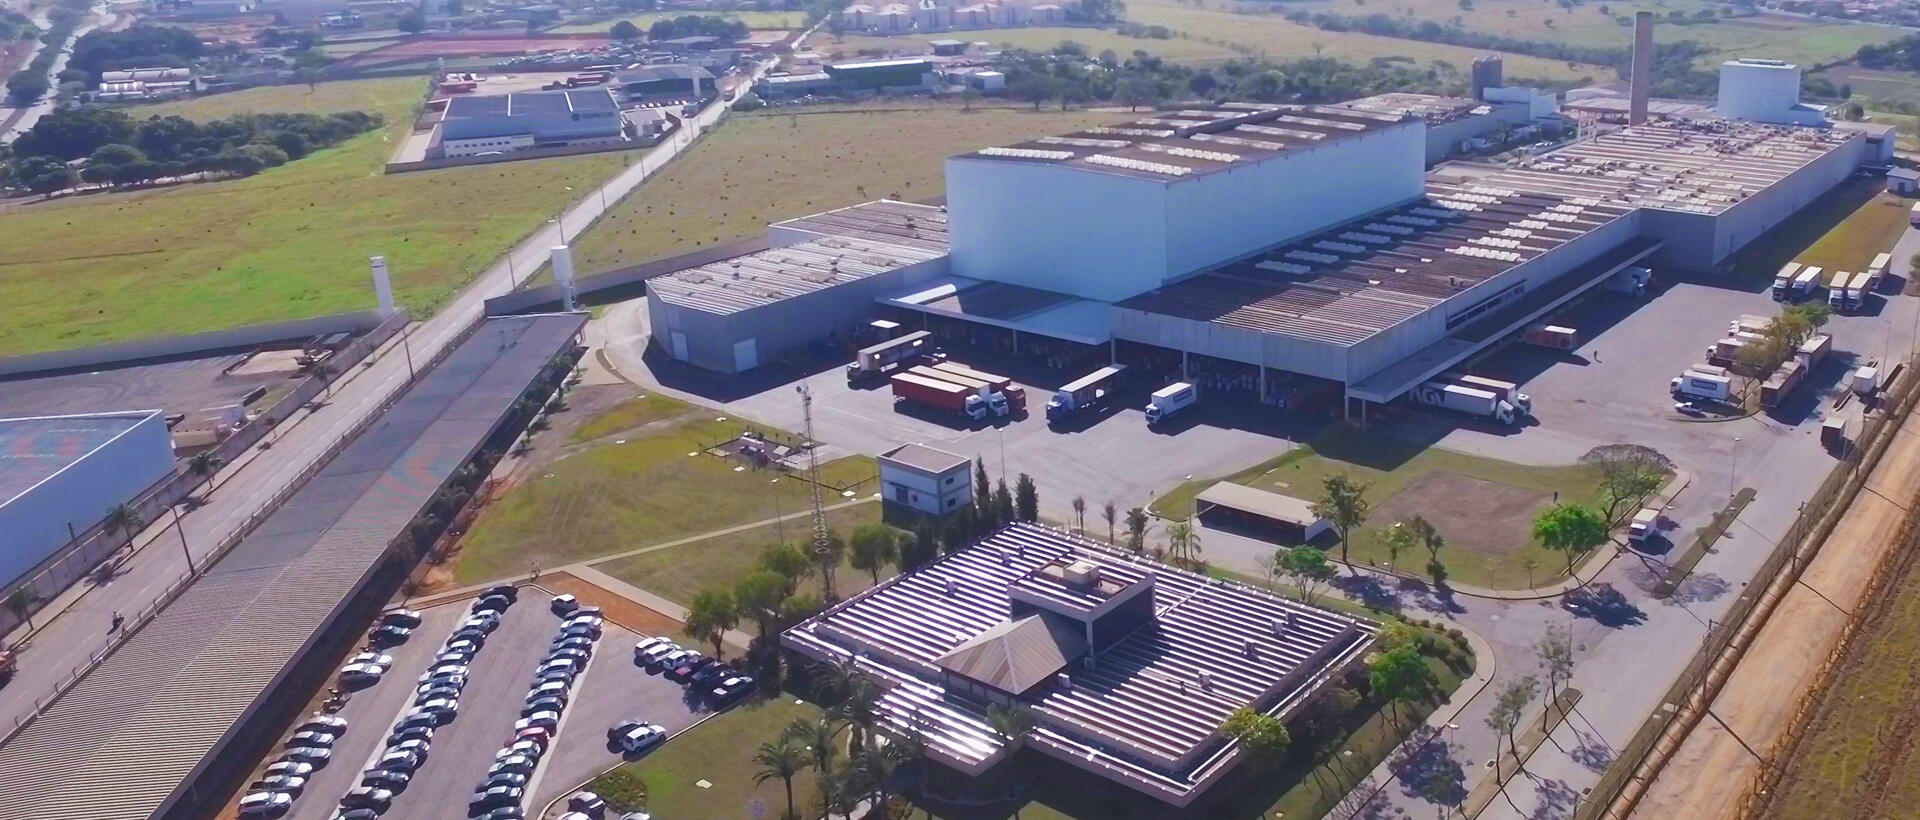 Imagem panorâmica da fábrica matriz da Selmi